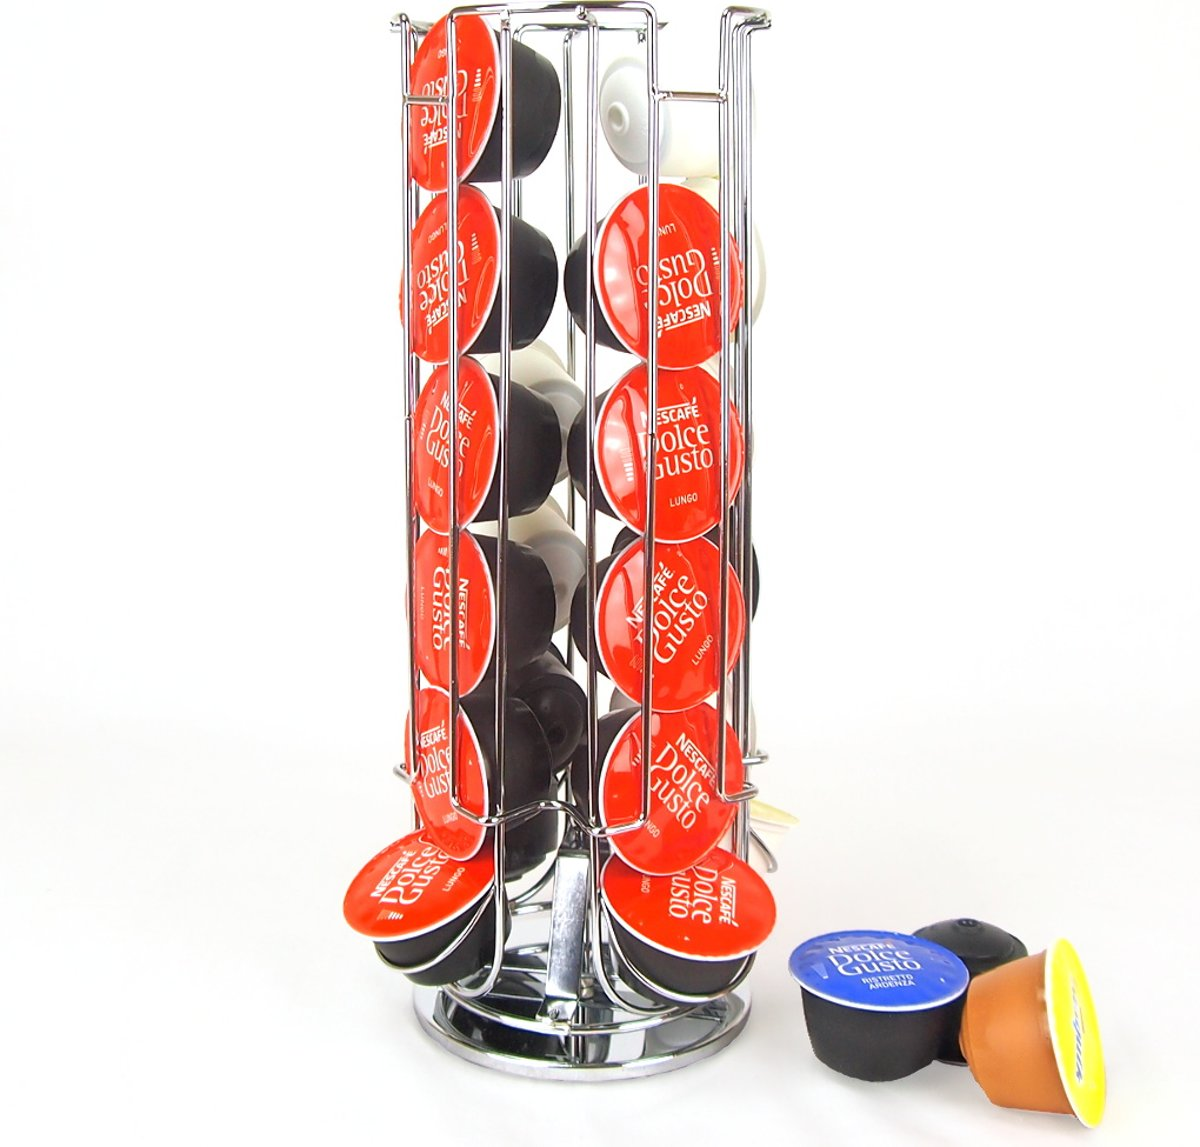 Vannons - Dolce Gusto Capsulehouder - Metaal - Standaard voor Dolce Gusto Koffiecups - Roterend - 24 Capsules - Zilver kopen